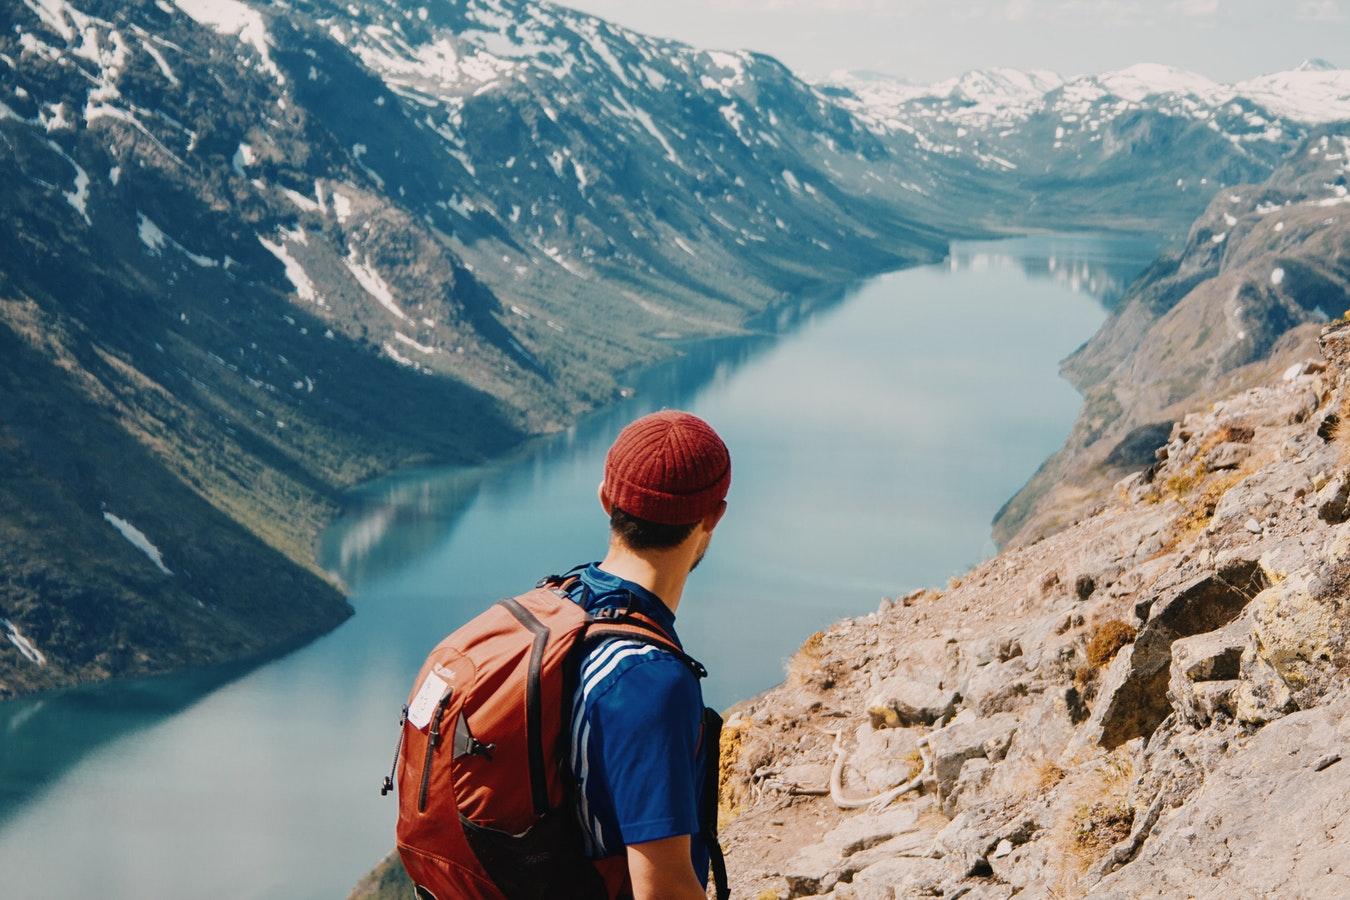 Best Hiking Sunglasses of 2019 | Hiking Sunglasses